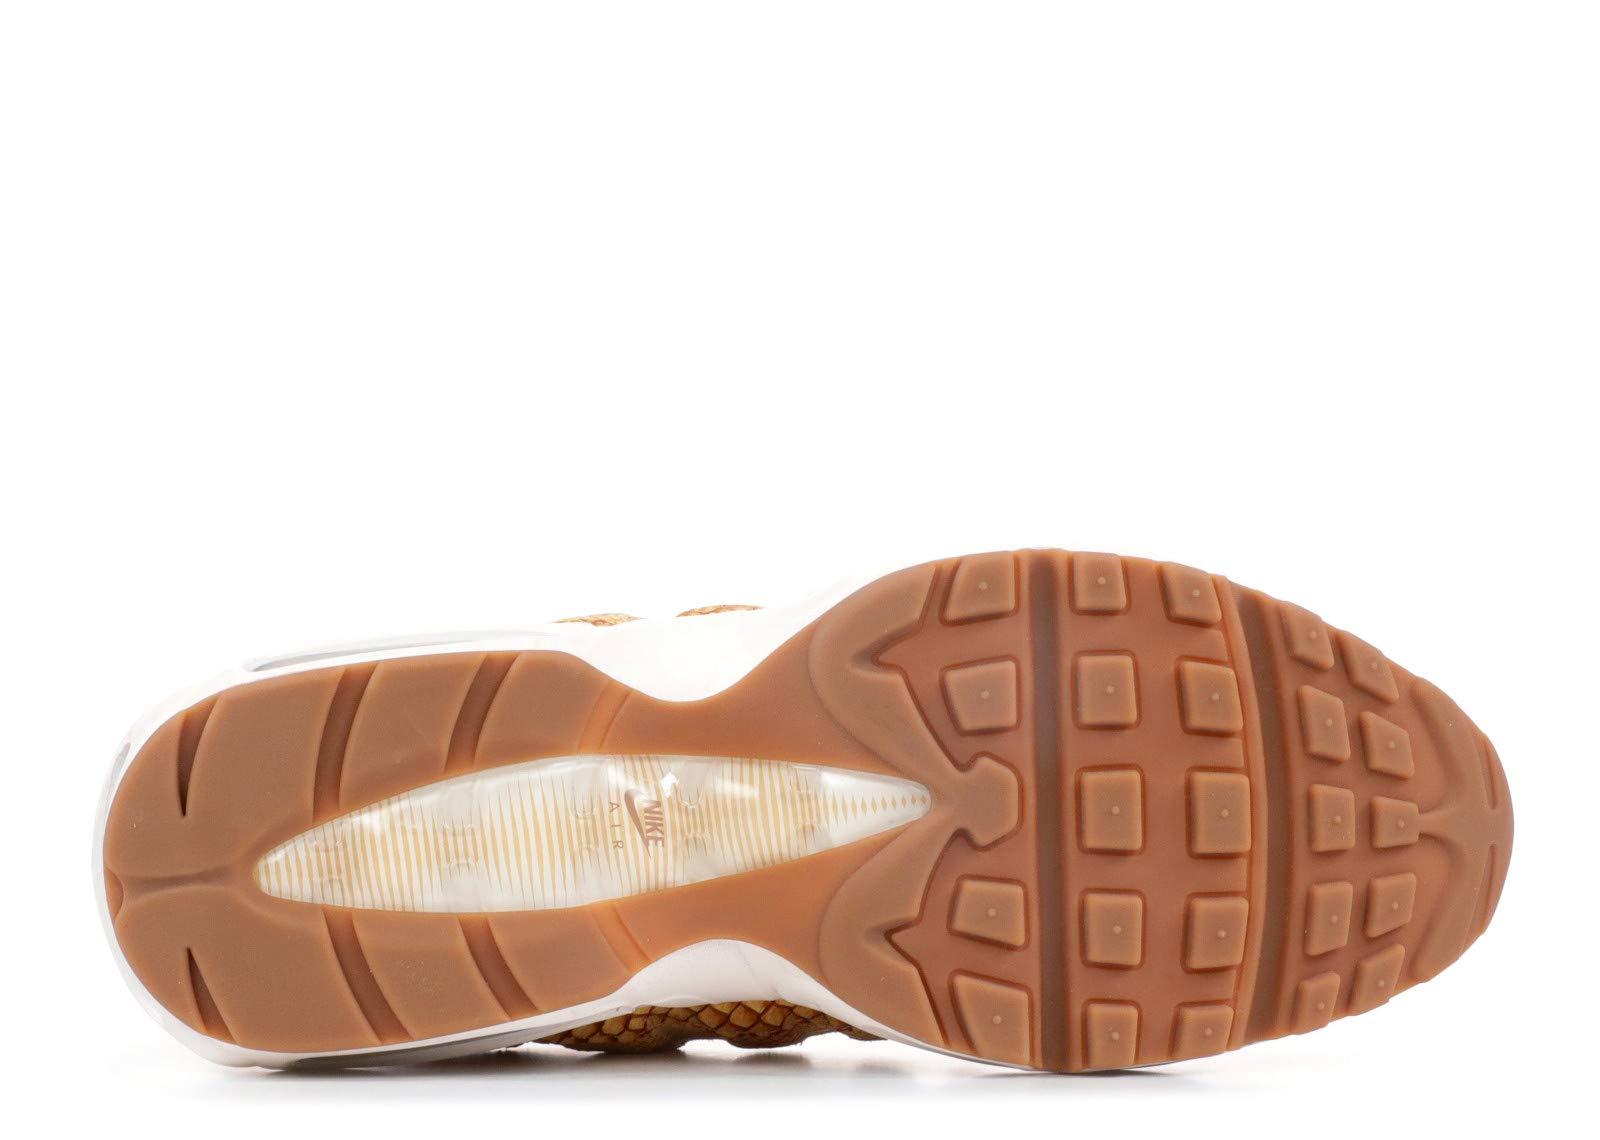 619VPoJw6FL - Nike Men's Air Max 95 Premium Se Running Shoes